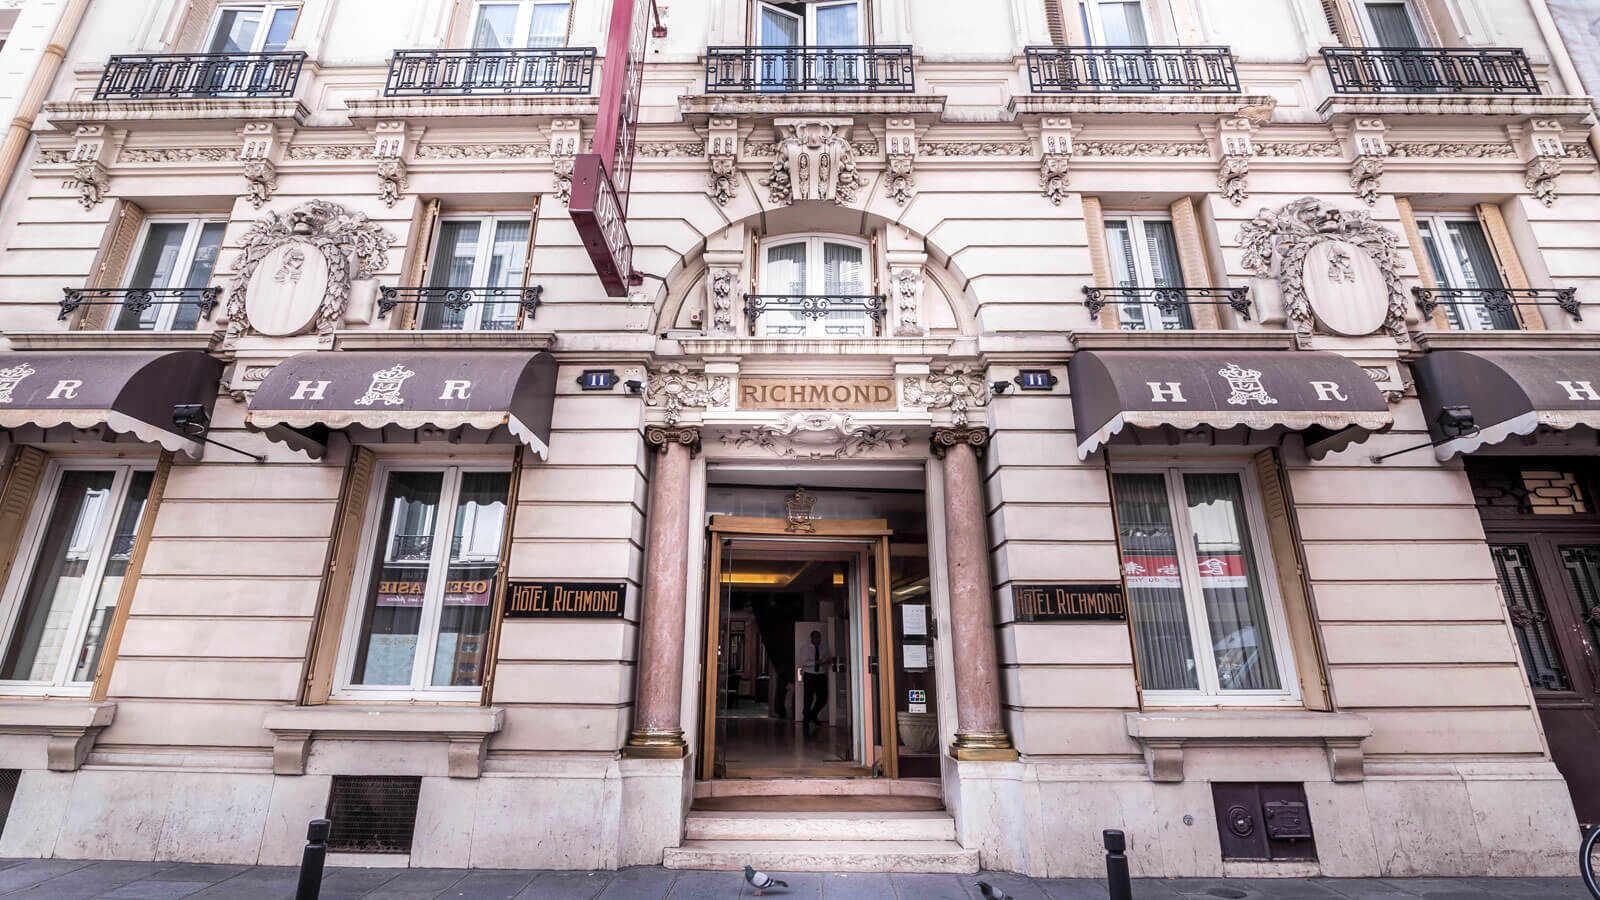 Hôtels Paris : Hôtel Richmond Opéra